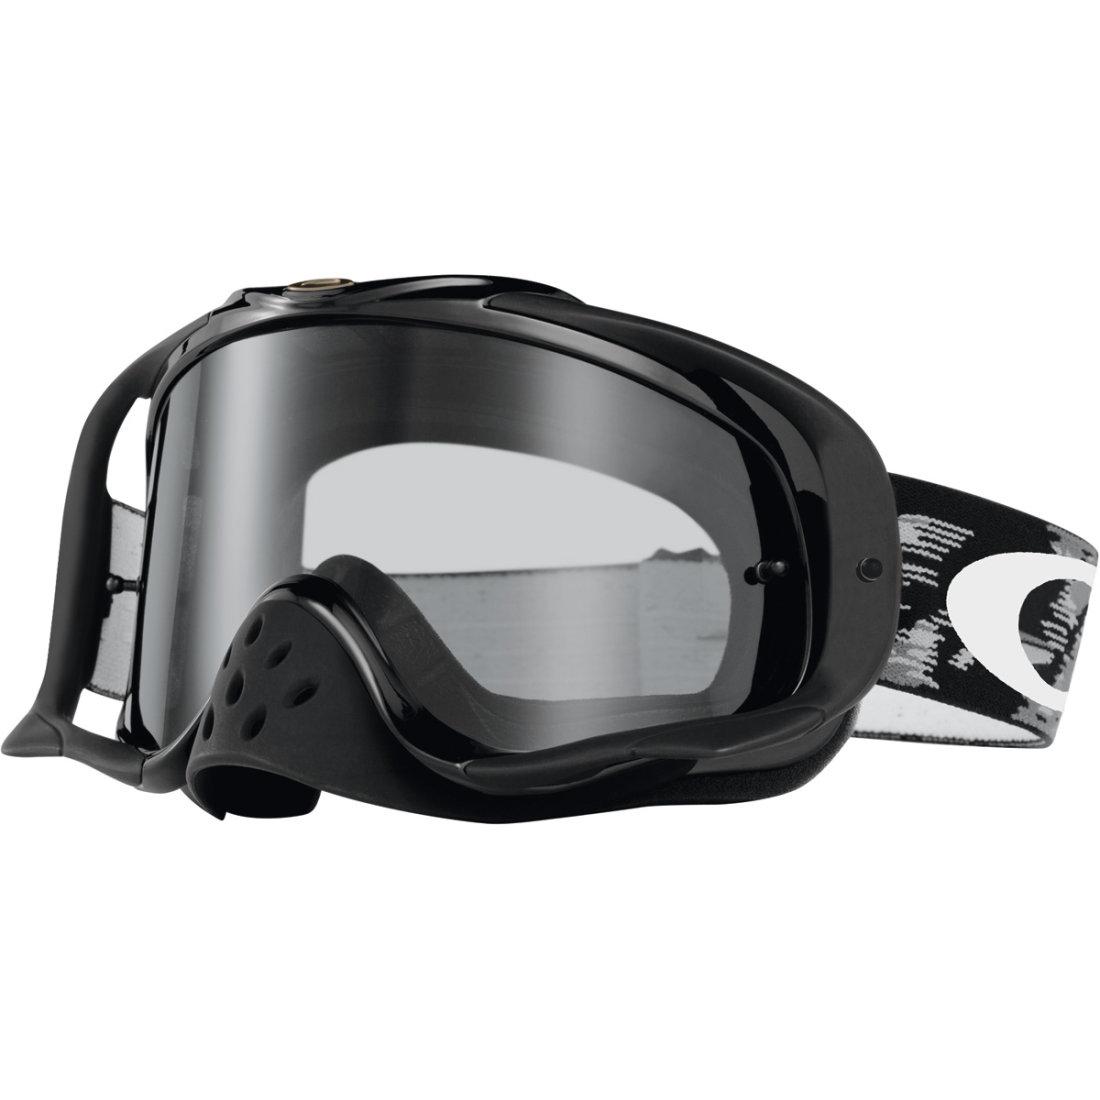 Lunettes Clear Crowbar Mx Jet Motocard Black Speed · Masque Oakley e2Y9IWEDH